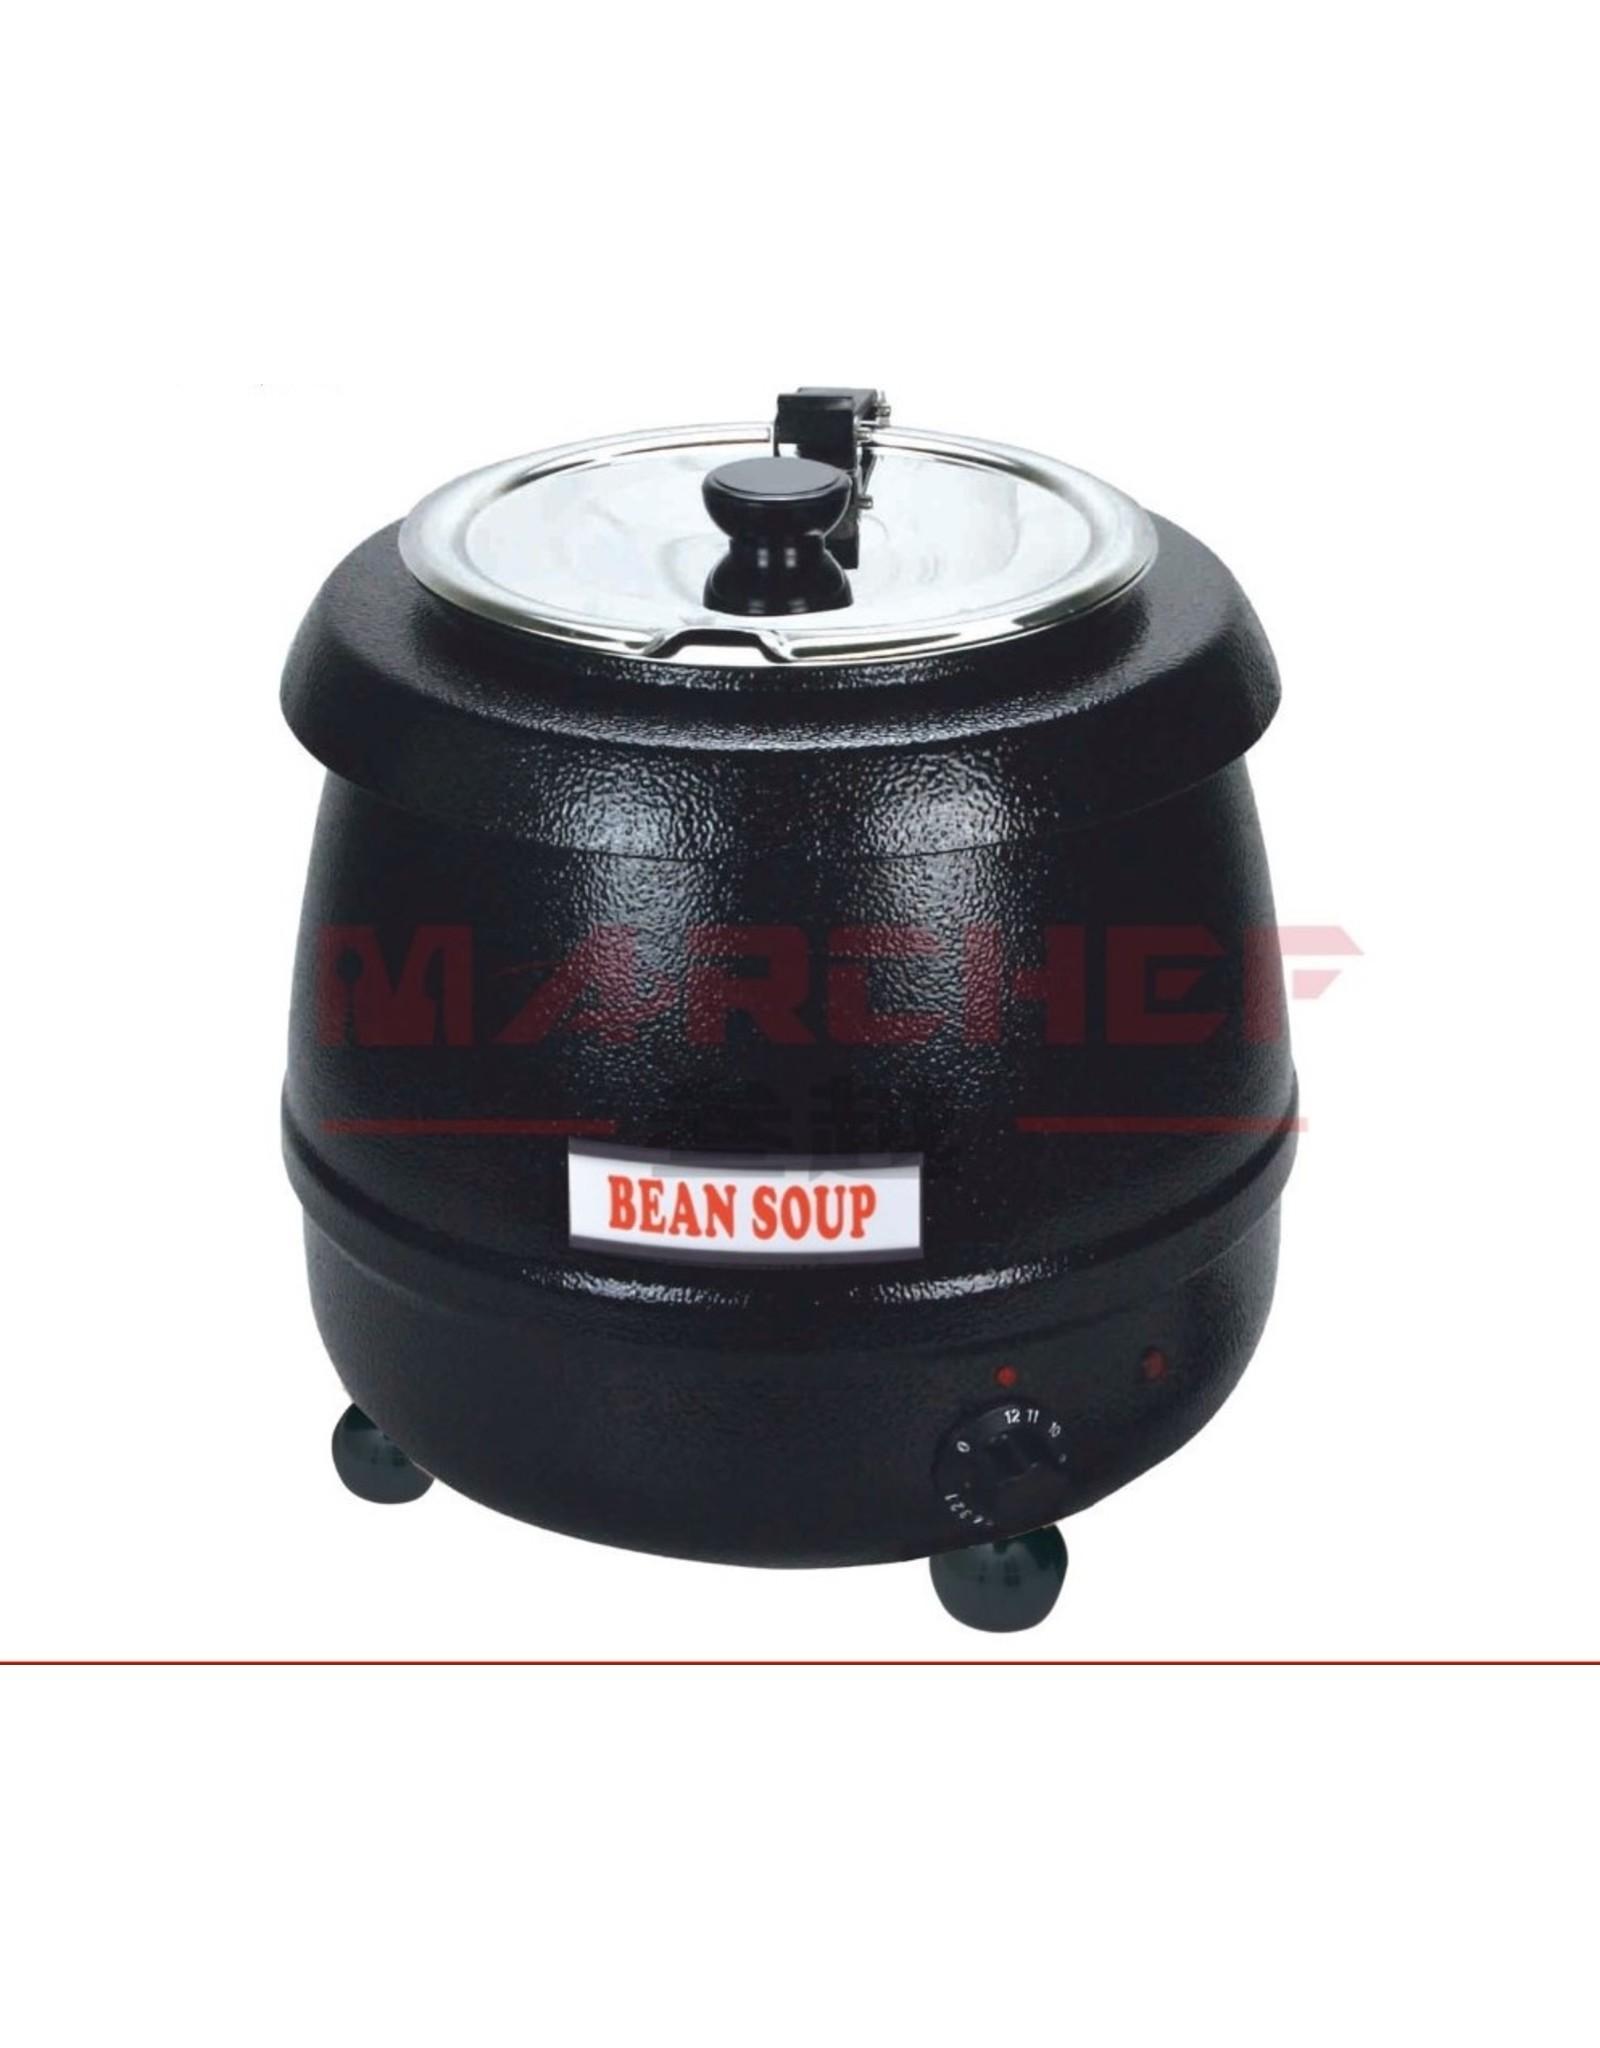 Q-Gastro Q-Gastro SK-10 Soepketel/Soepverwarmer 10 Liter 230V (Nieuw)